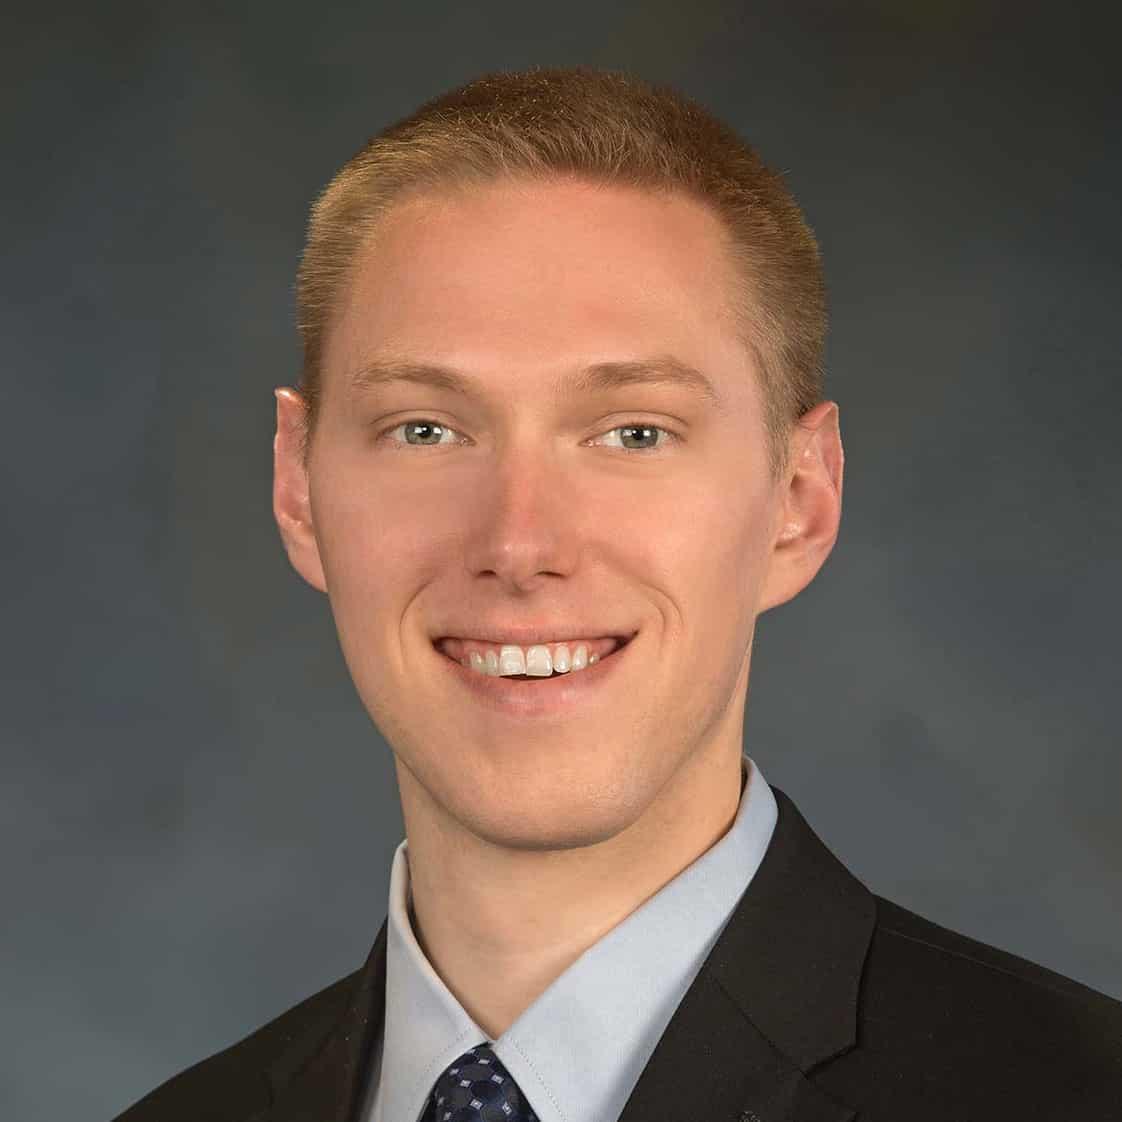 Thomas Pivnicny - Attorney at Kitay Law Offices